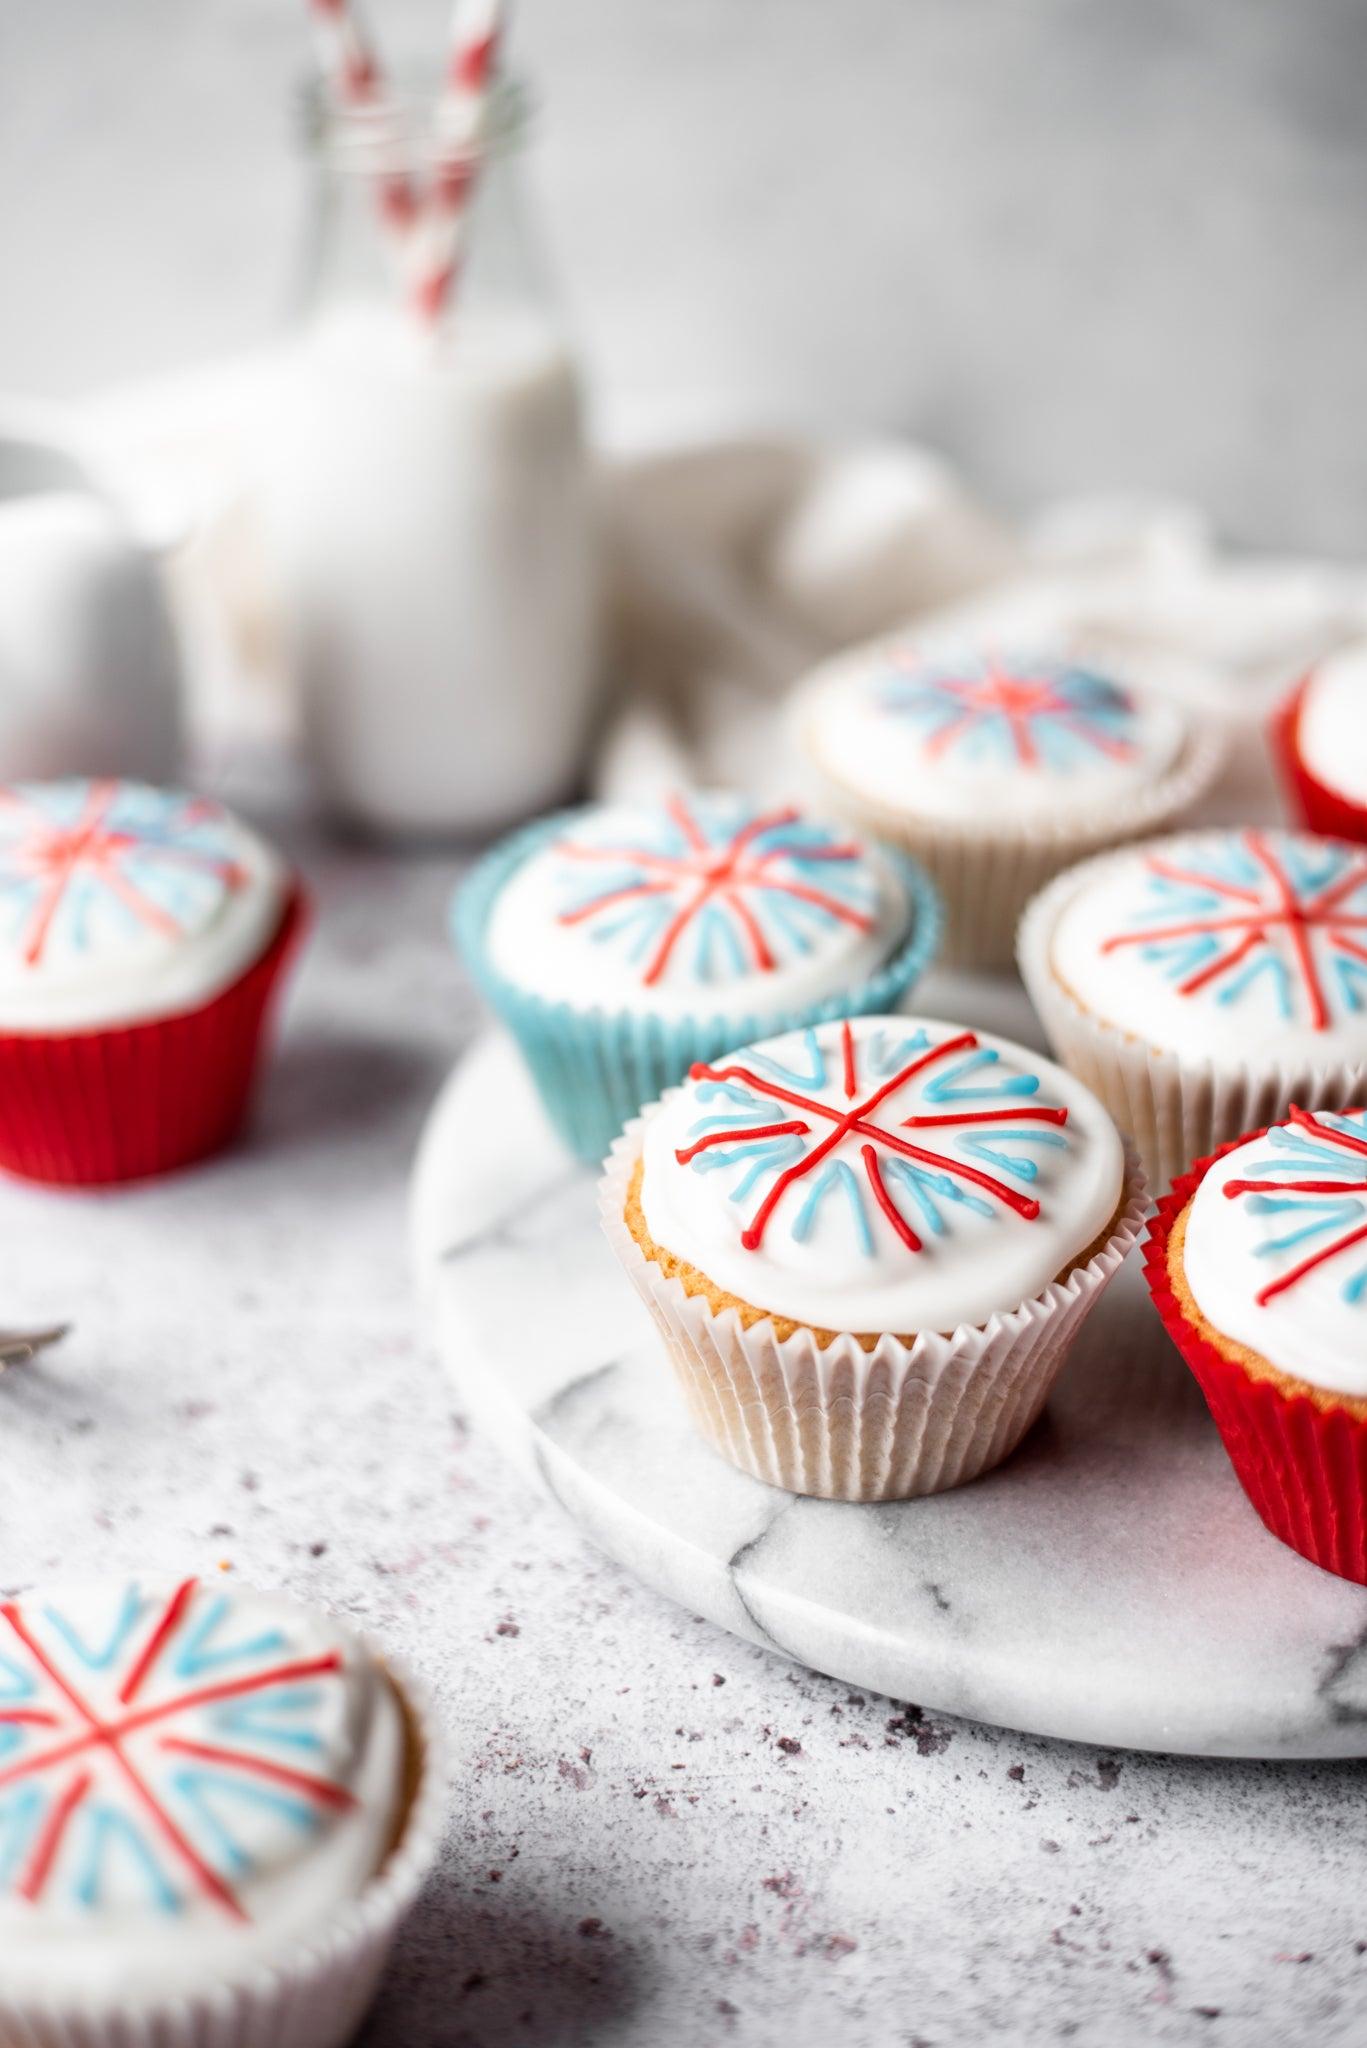 Union-Jack-Cupcakes-WEB-RES-4.jpg